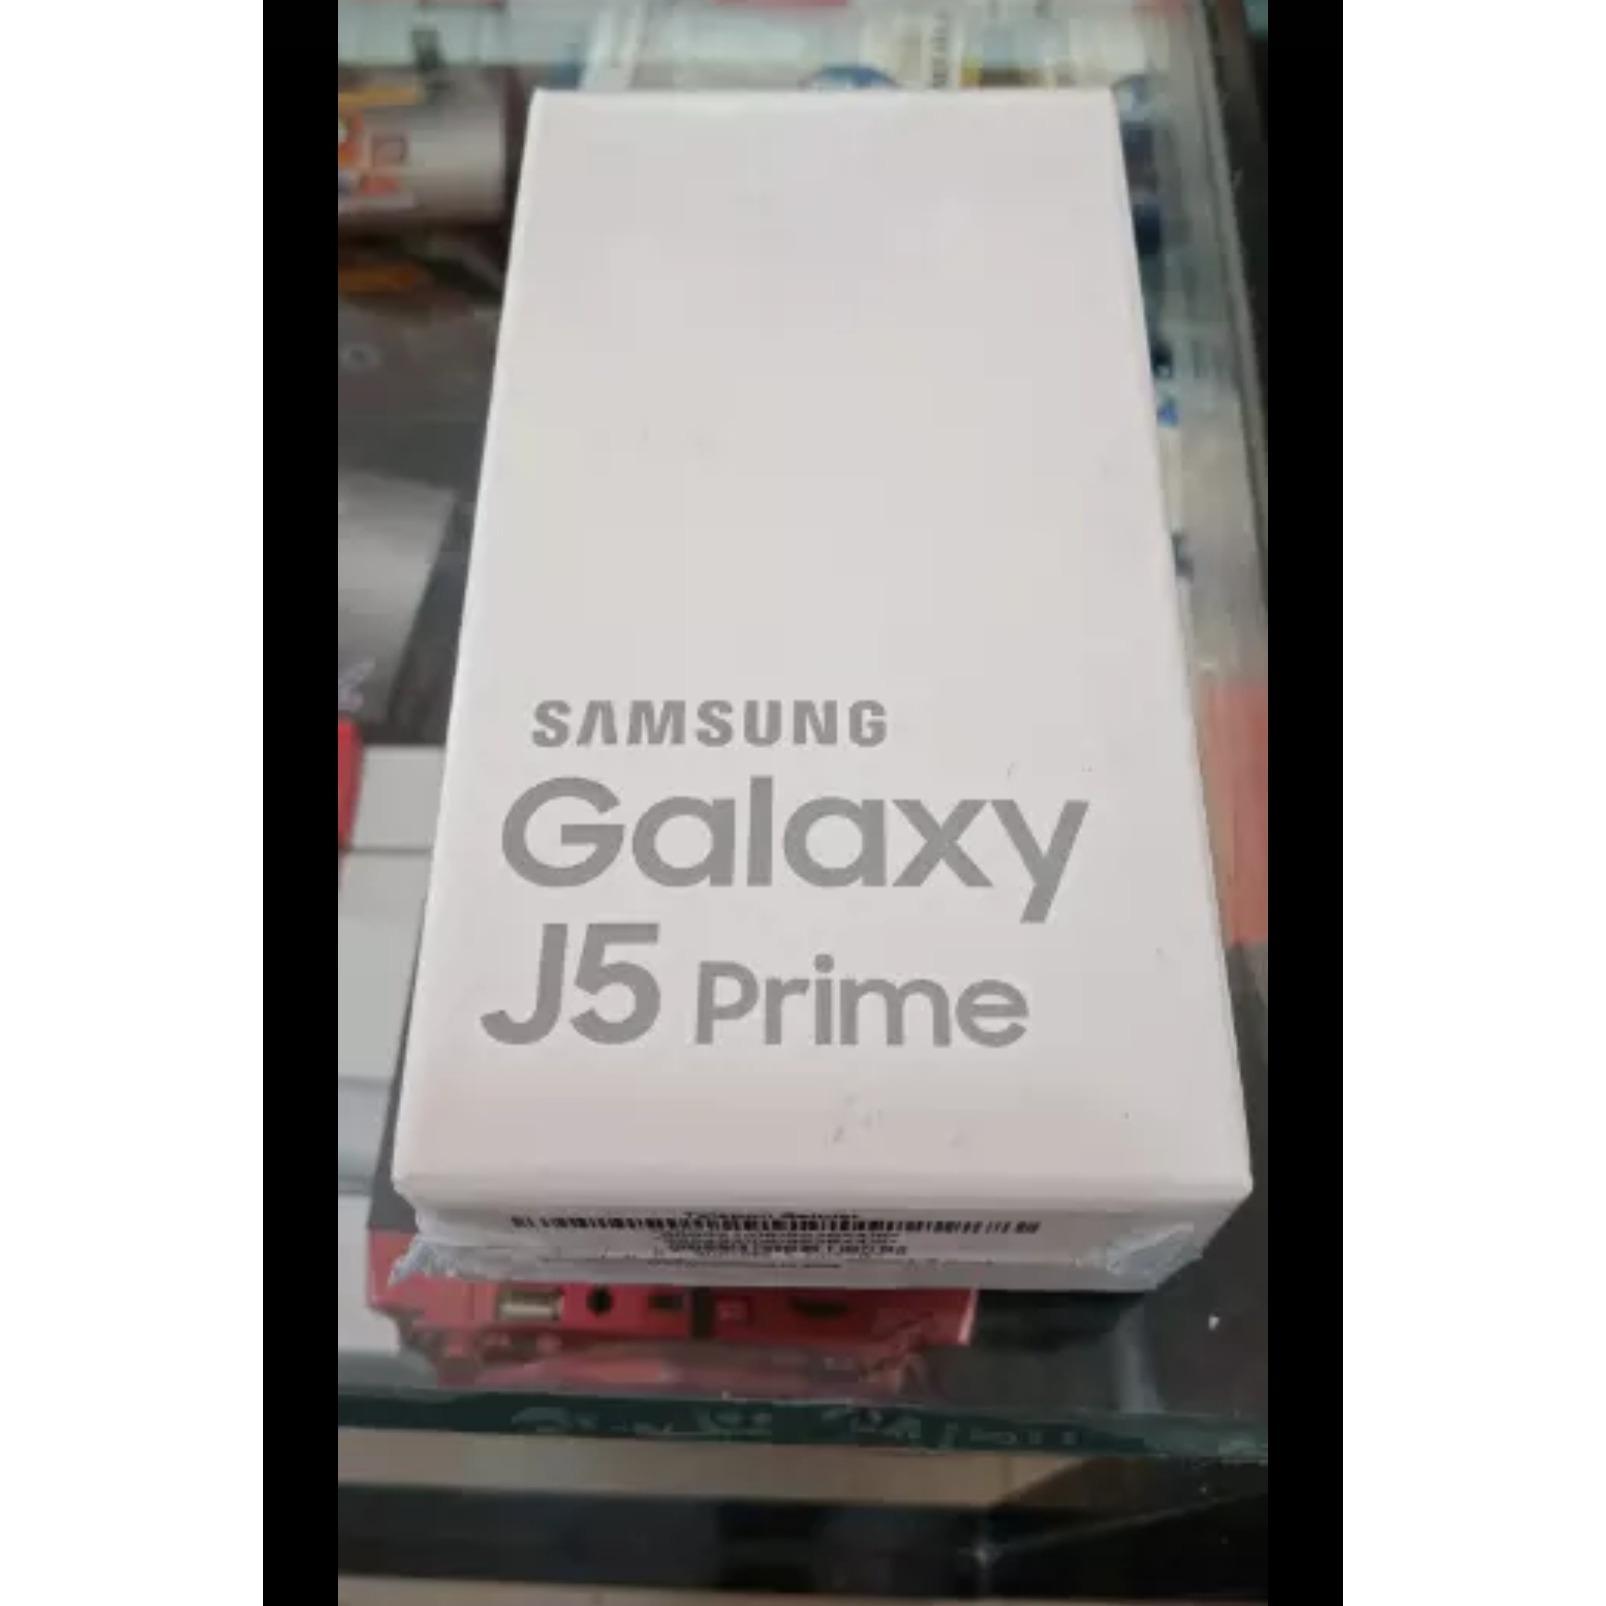 Jual alat Pembersih kotoran telinga dalam kering elektrik waxvac original di lapak seli shop seli_shop. Source · Samsung Galaxy J5 Prime